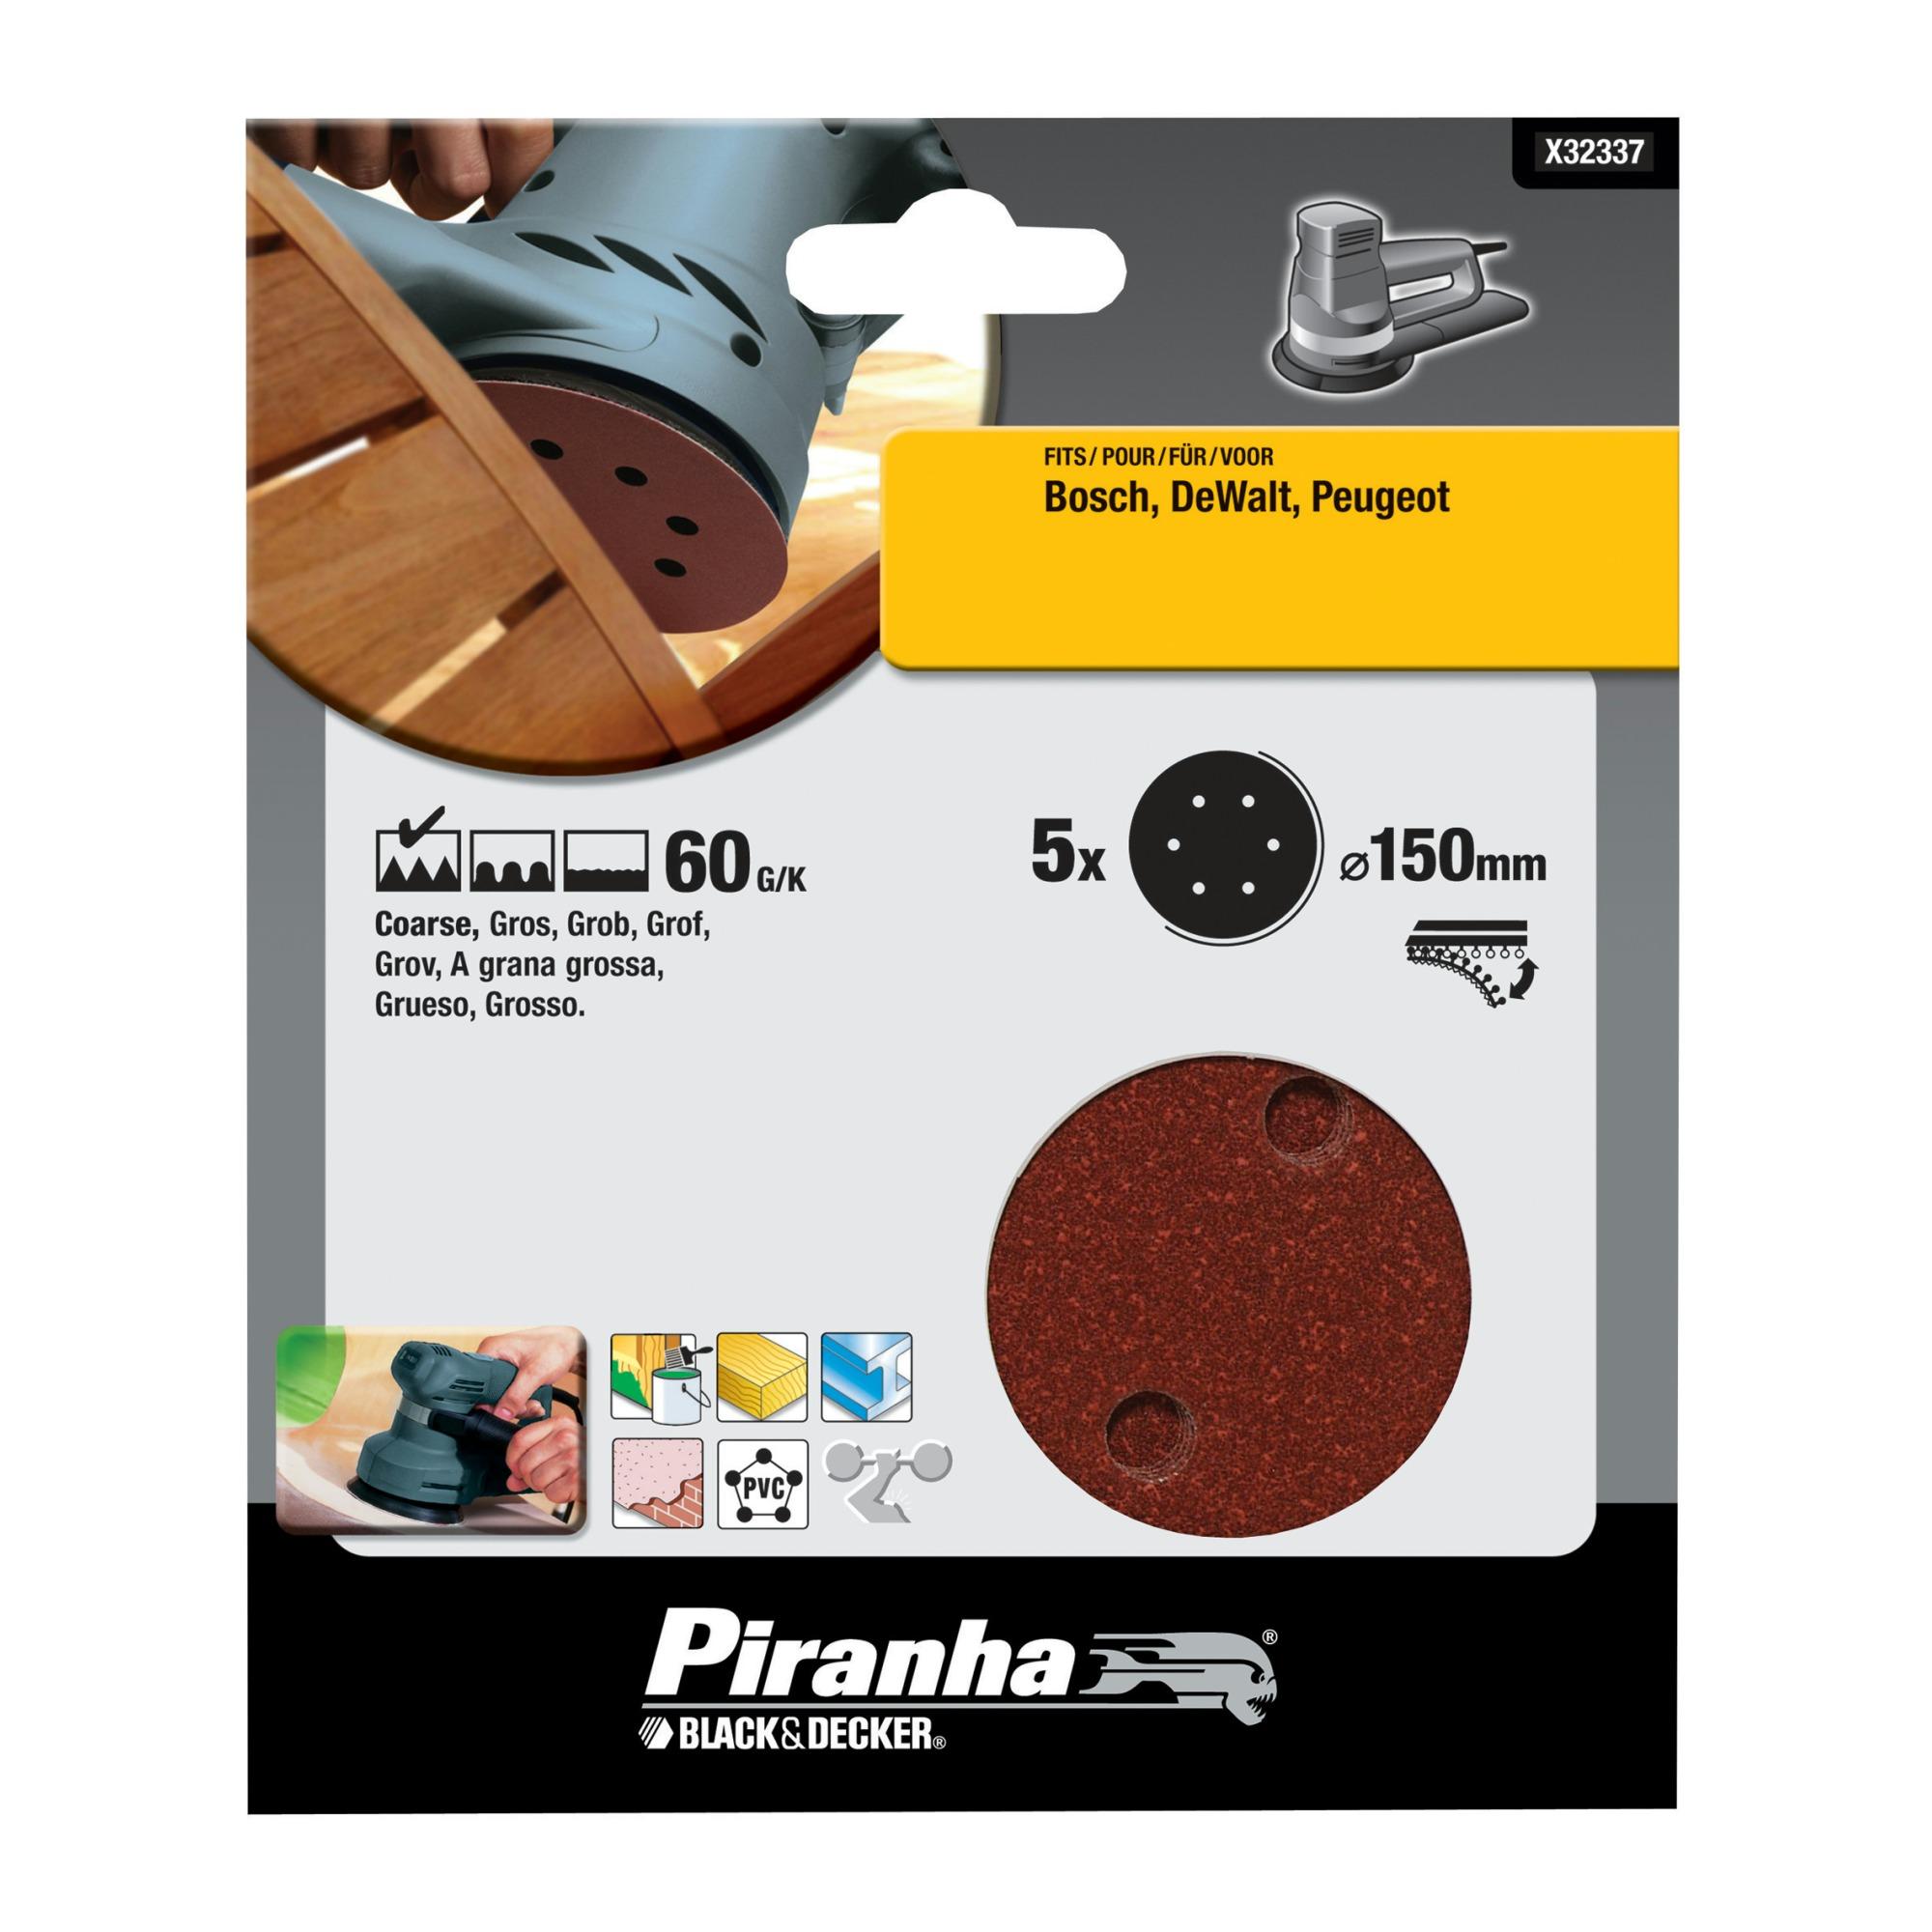 Piranha schuurschijf X32337-XJ K60 150 mm (5 stuks)